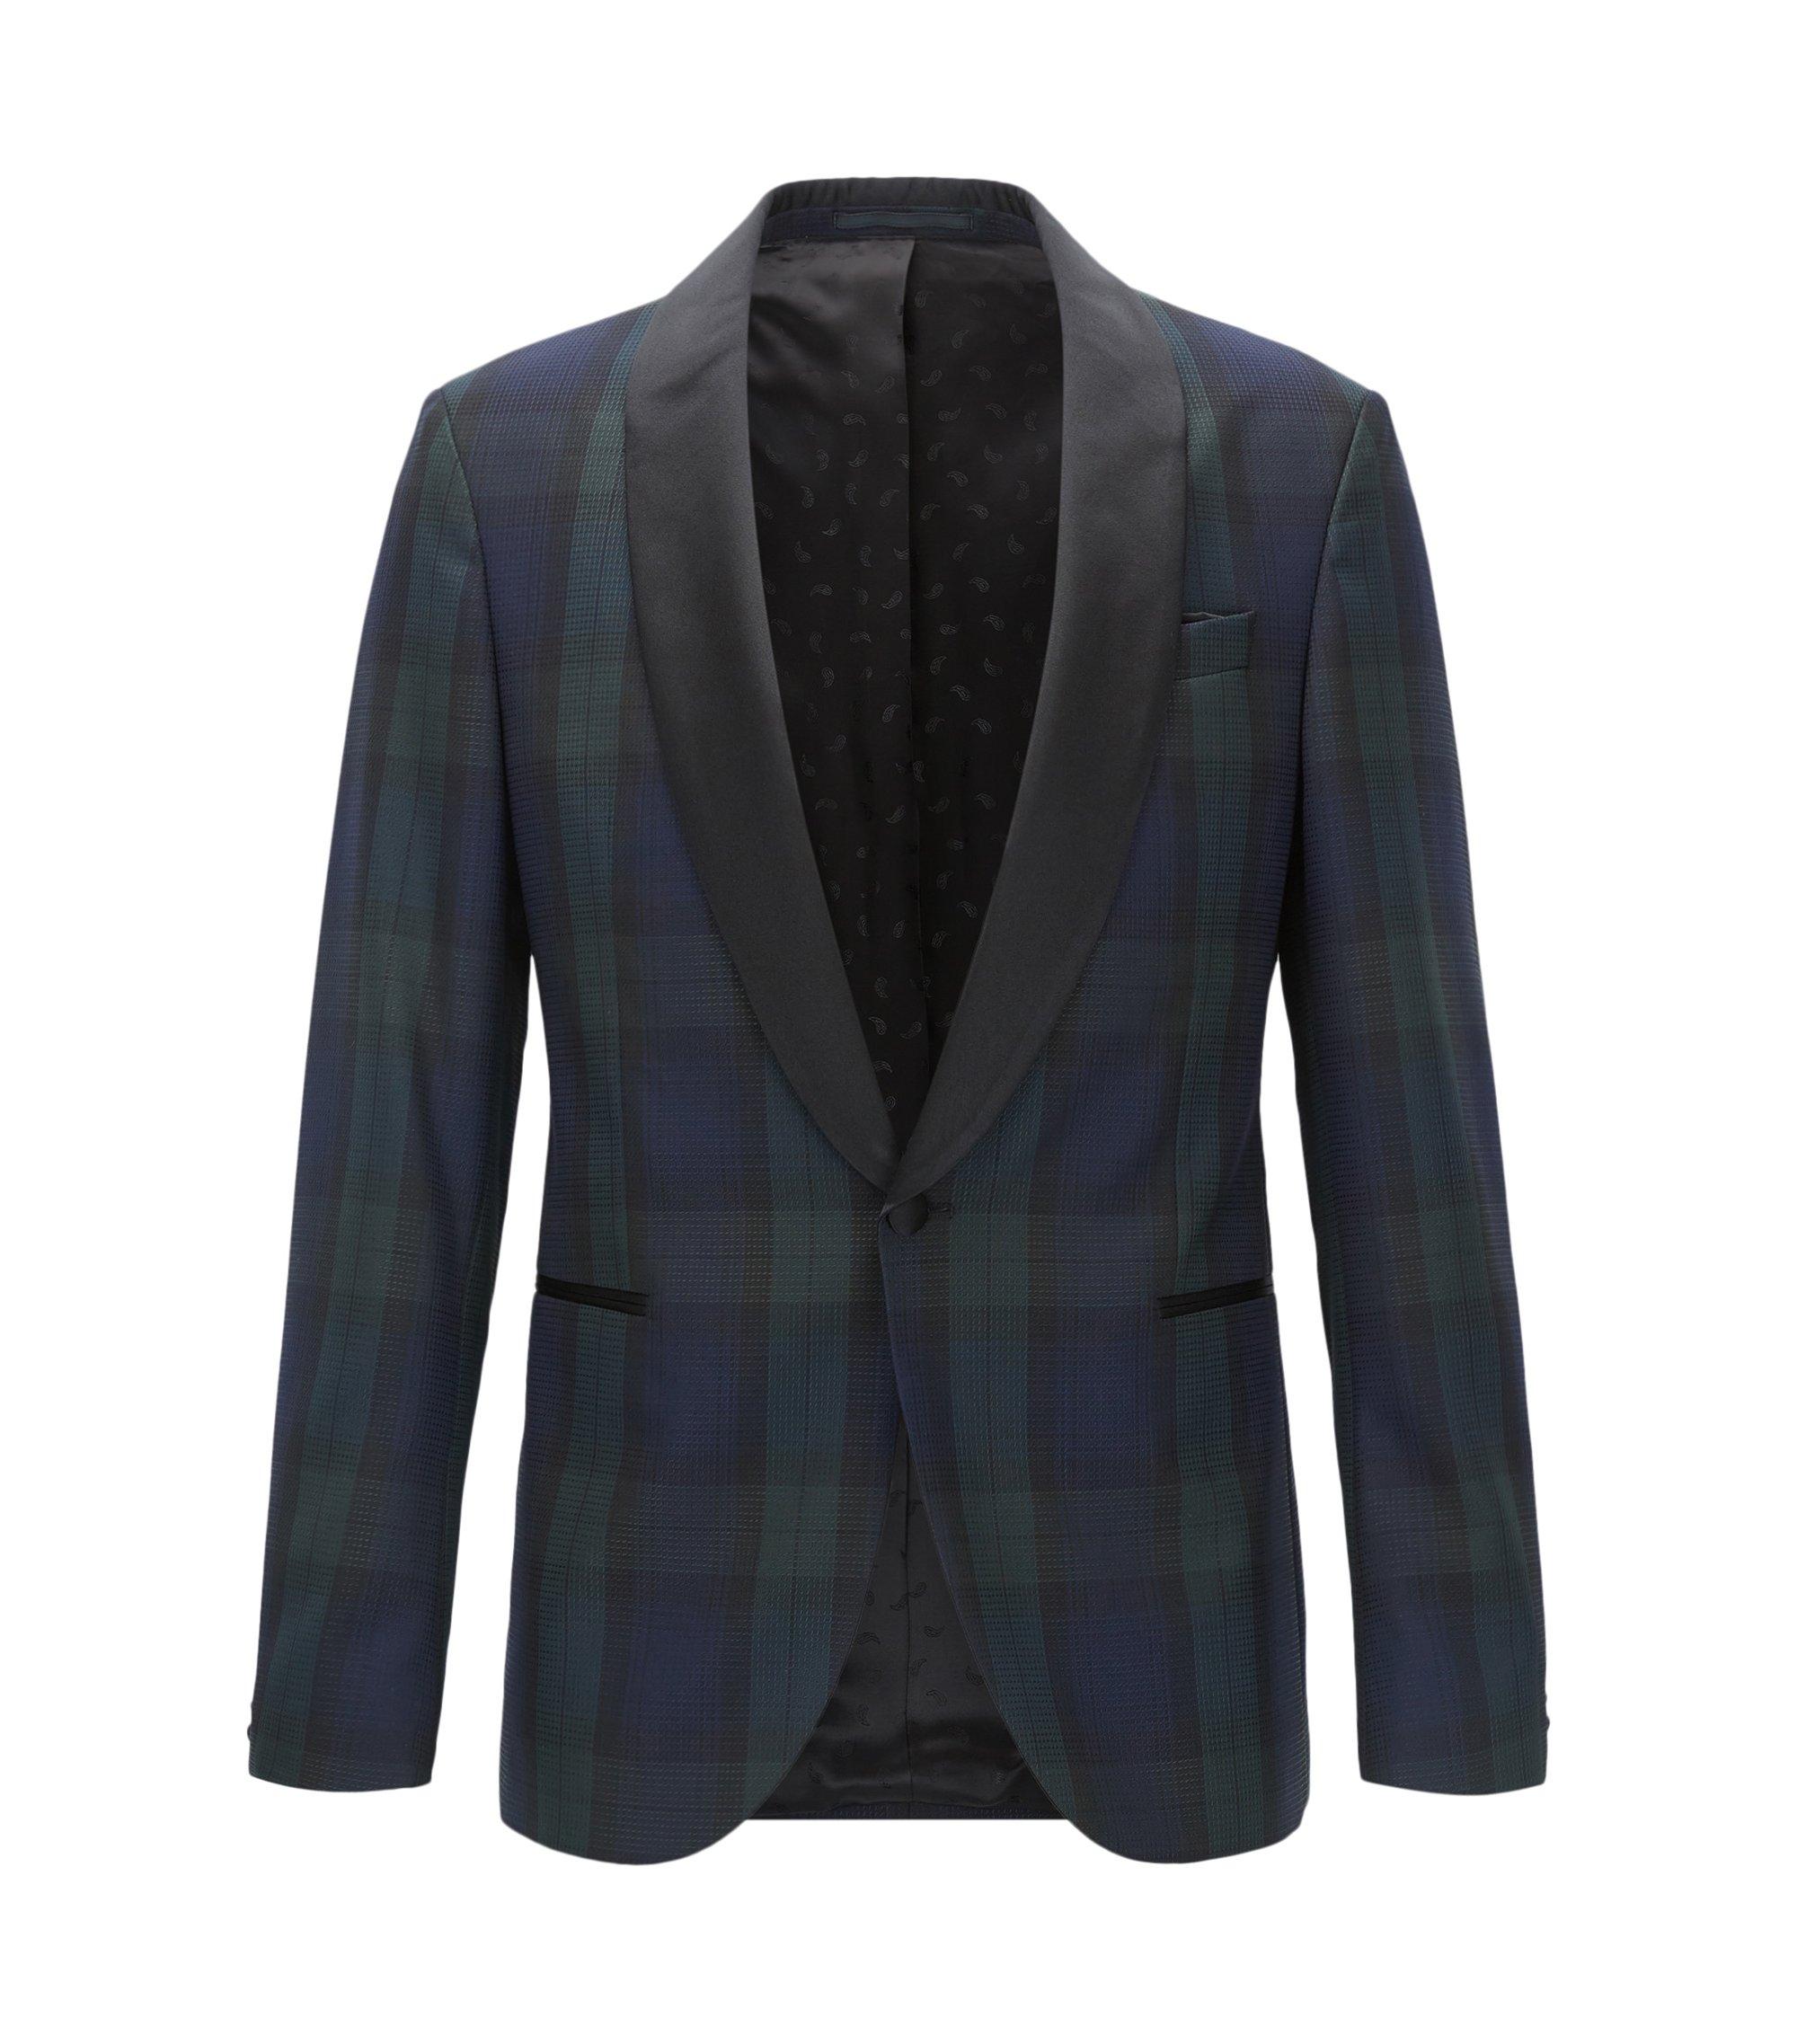 Black Watch Plaid Wool Evening Jacket, Slim Fit   Nemir, Open Green